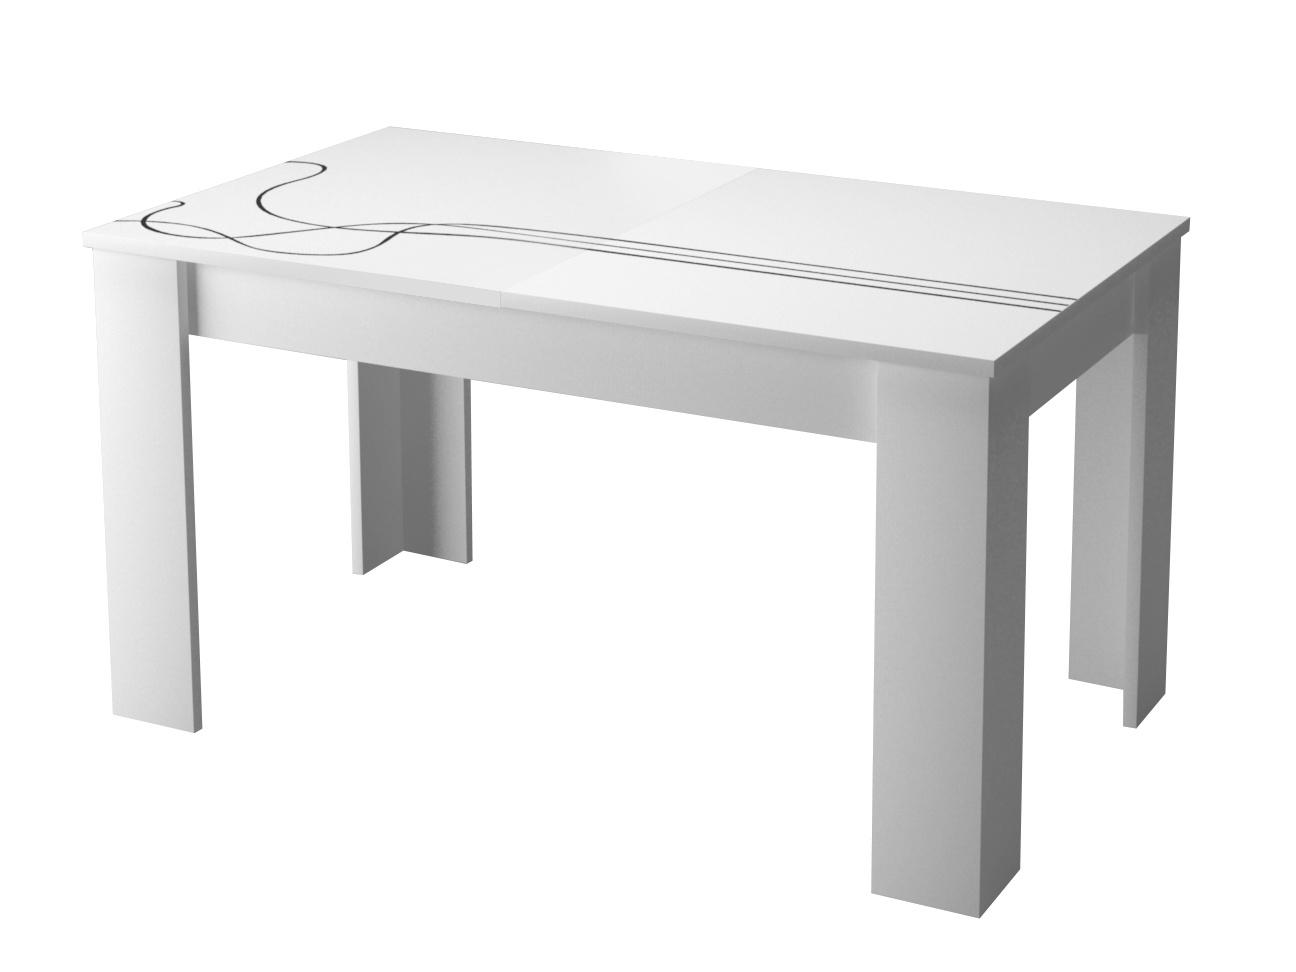 Smartshop Jídelní rozkládací stůl LINO LL140, bílá/vzor